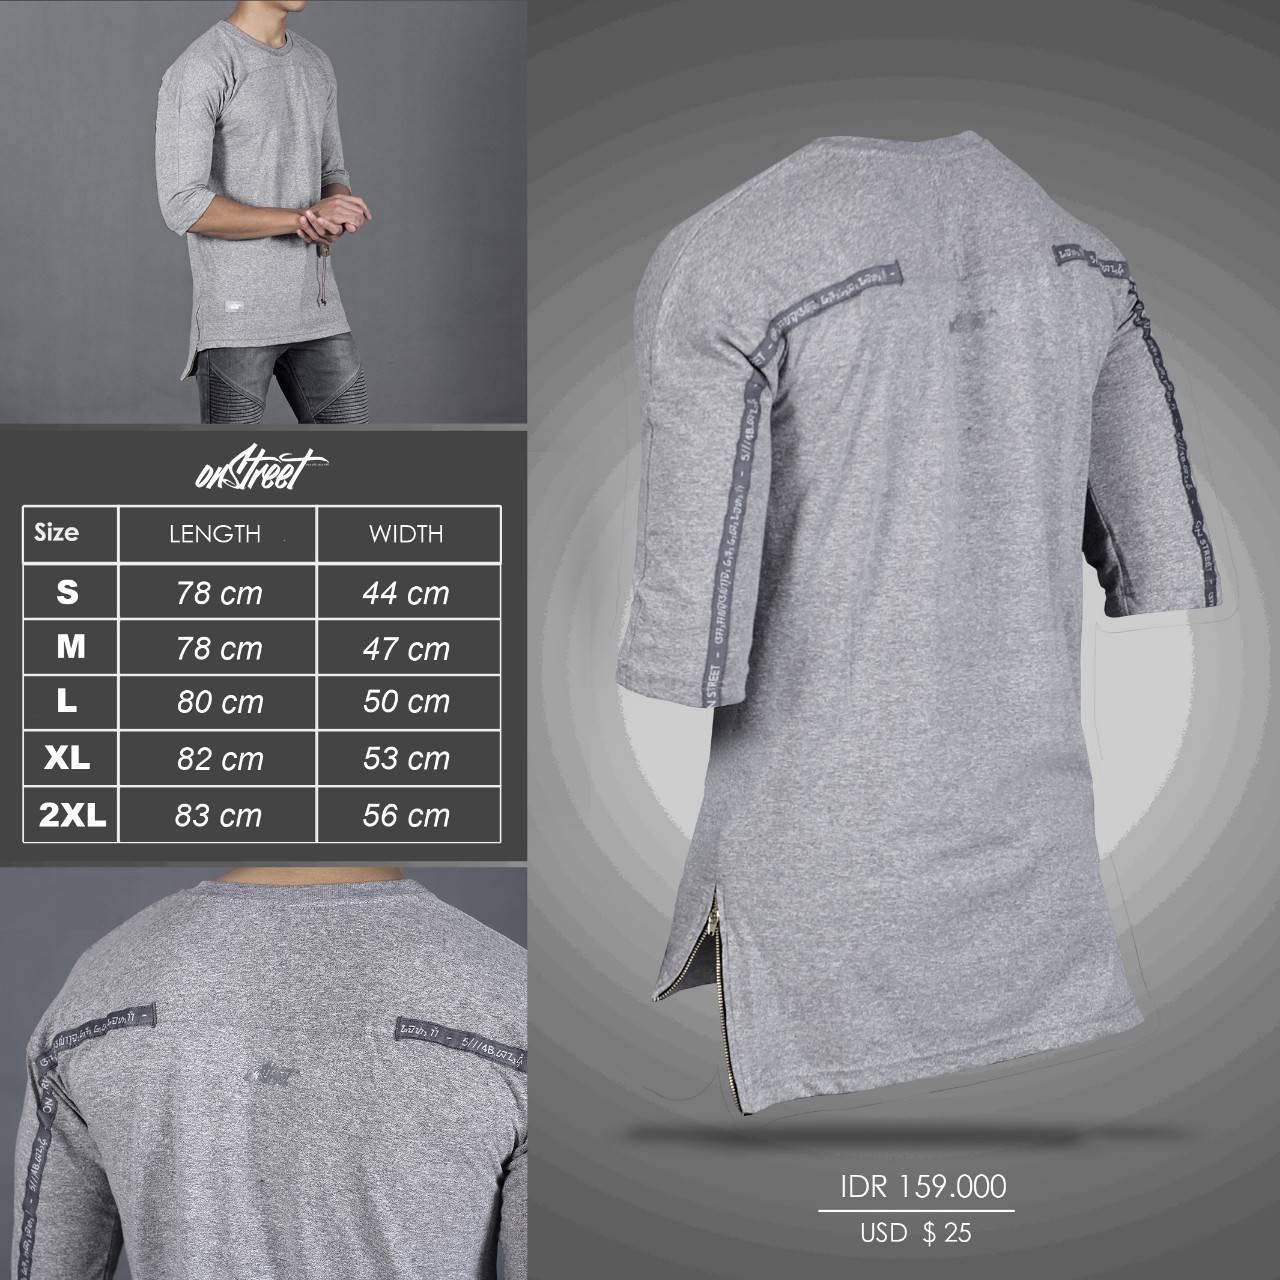 kaos / t-shirt raglan longline backstrip onstreet original